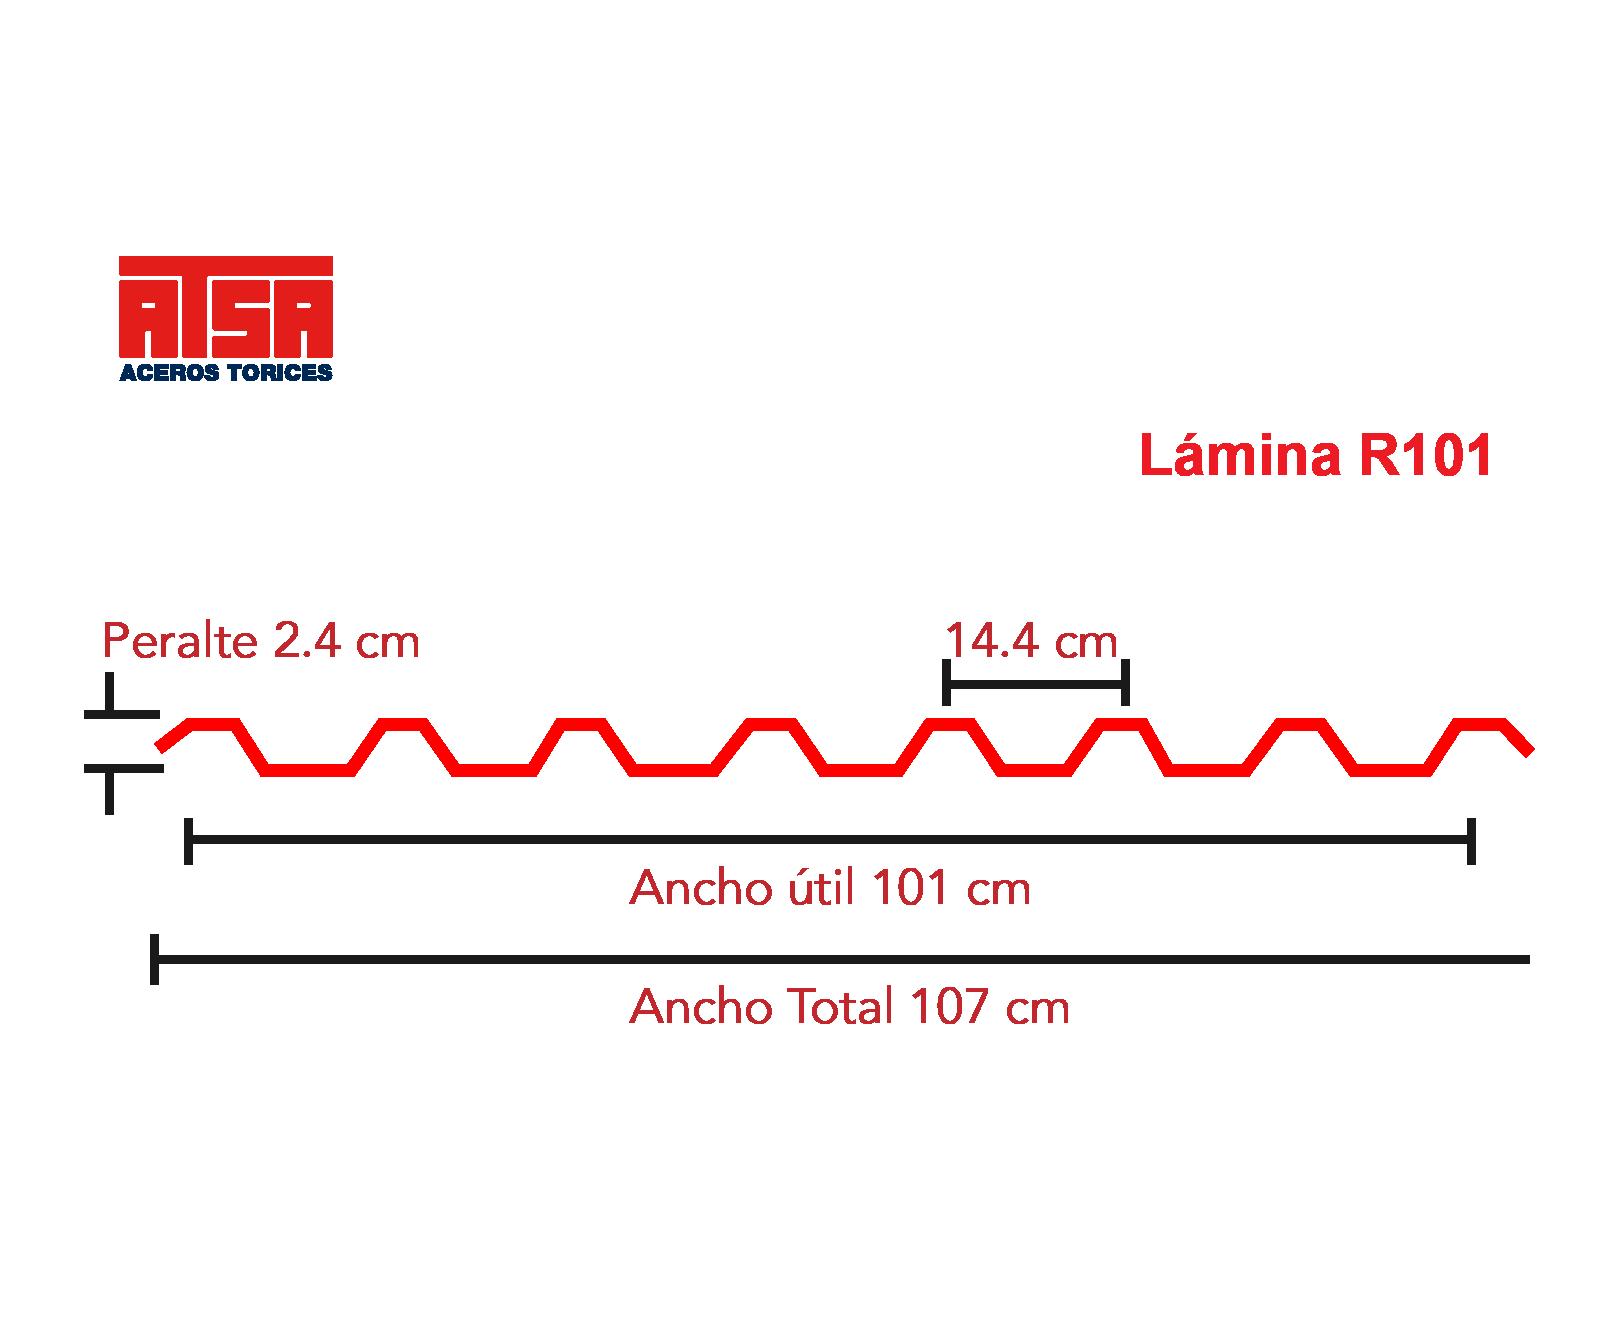 medidas-perfil-r101-lamina-de-aceros-atsa